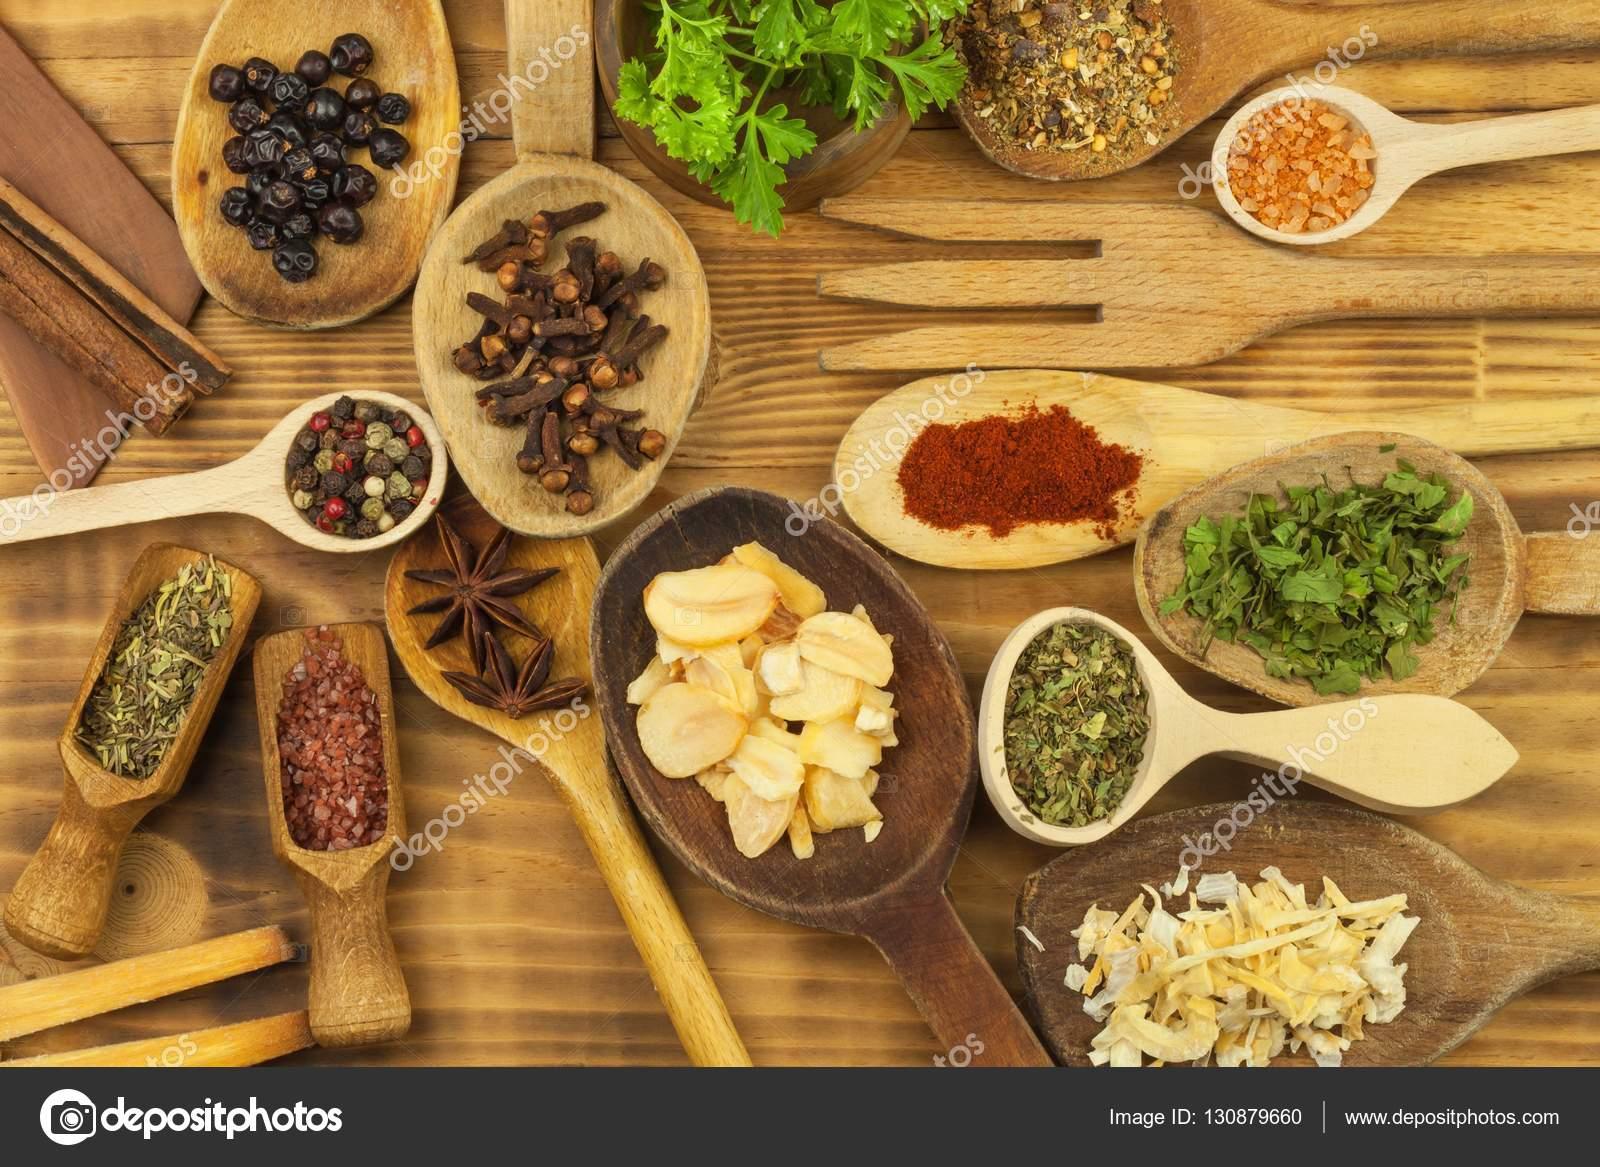 kitchen tables & more rustic table and chair sets 等各种香料在厨房的桌子上 调味食品 销售为一体的异国香料 在香料上做 销售为一体